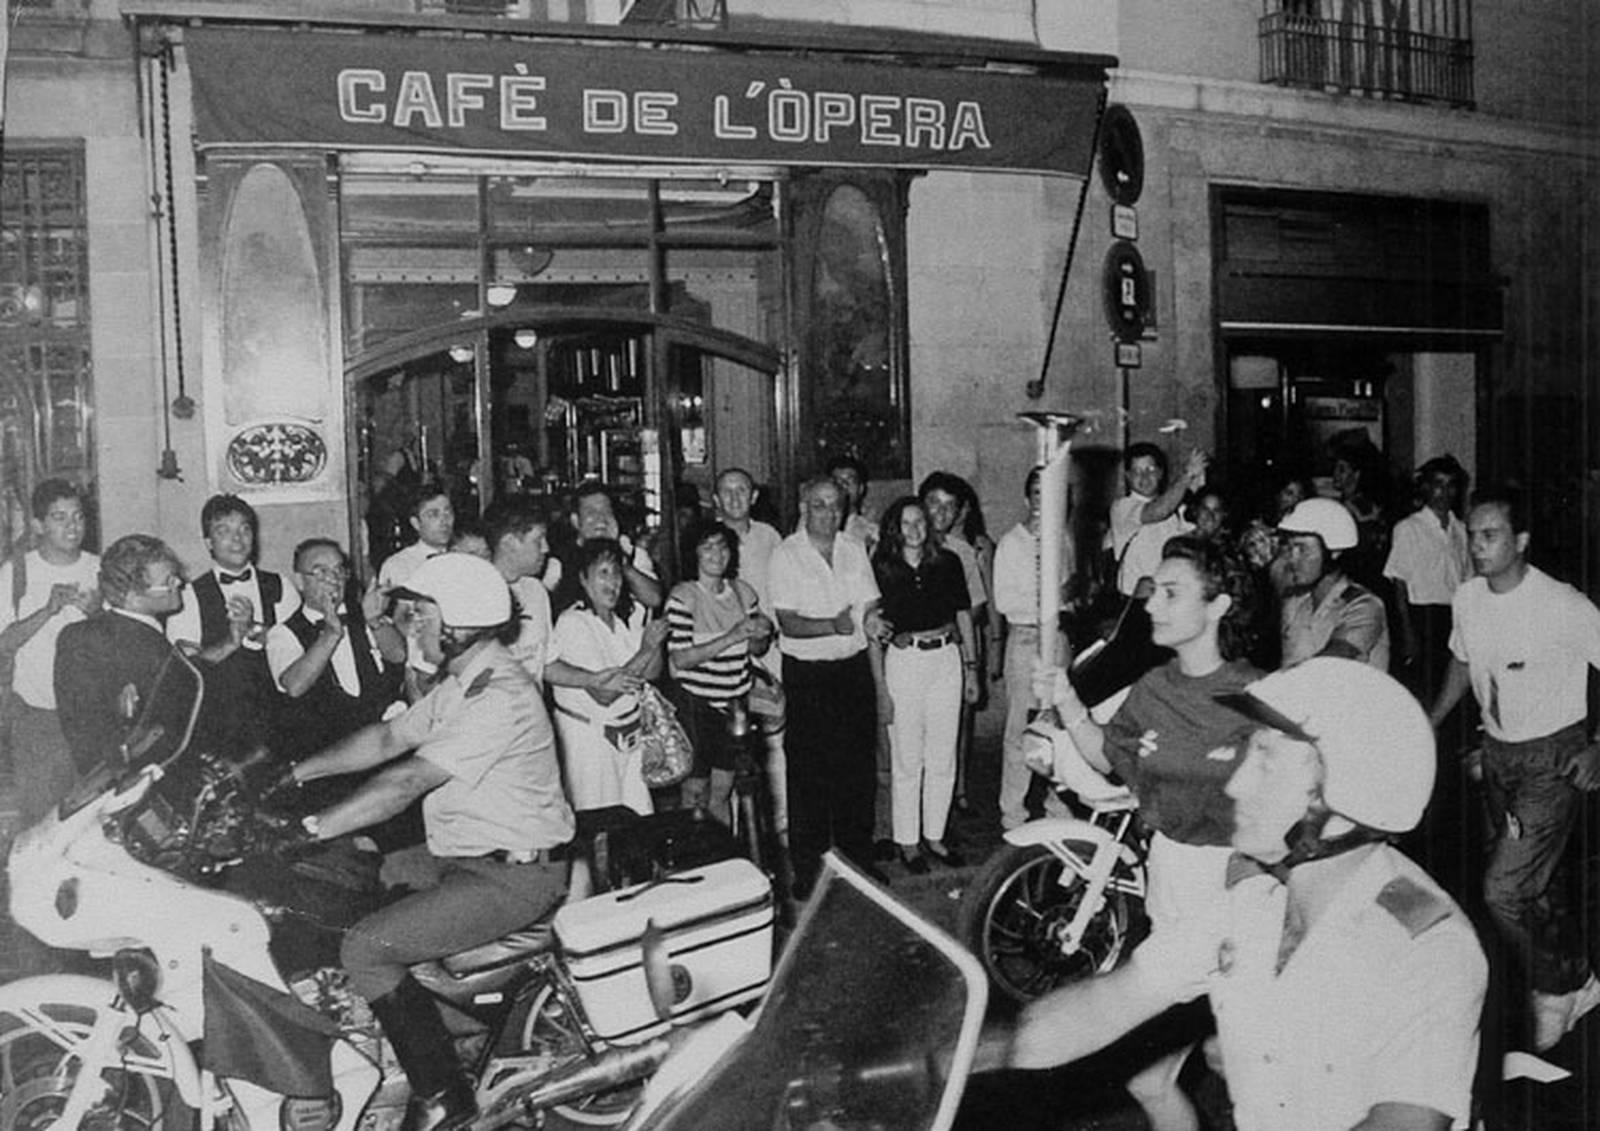 CAFE DE L΄ OPERA